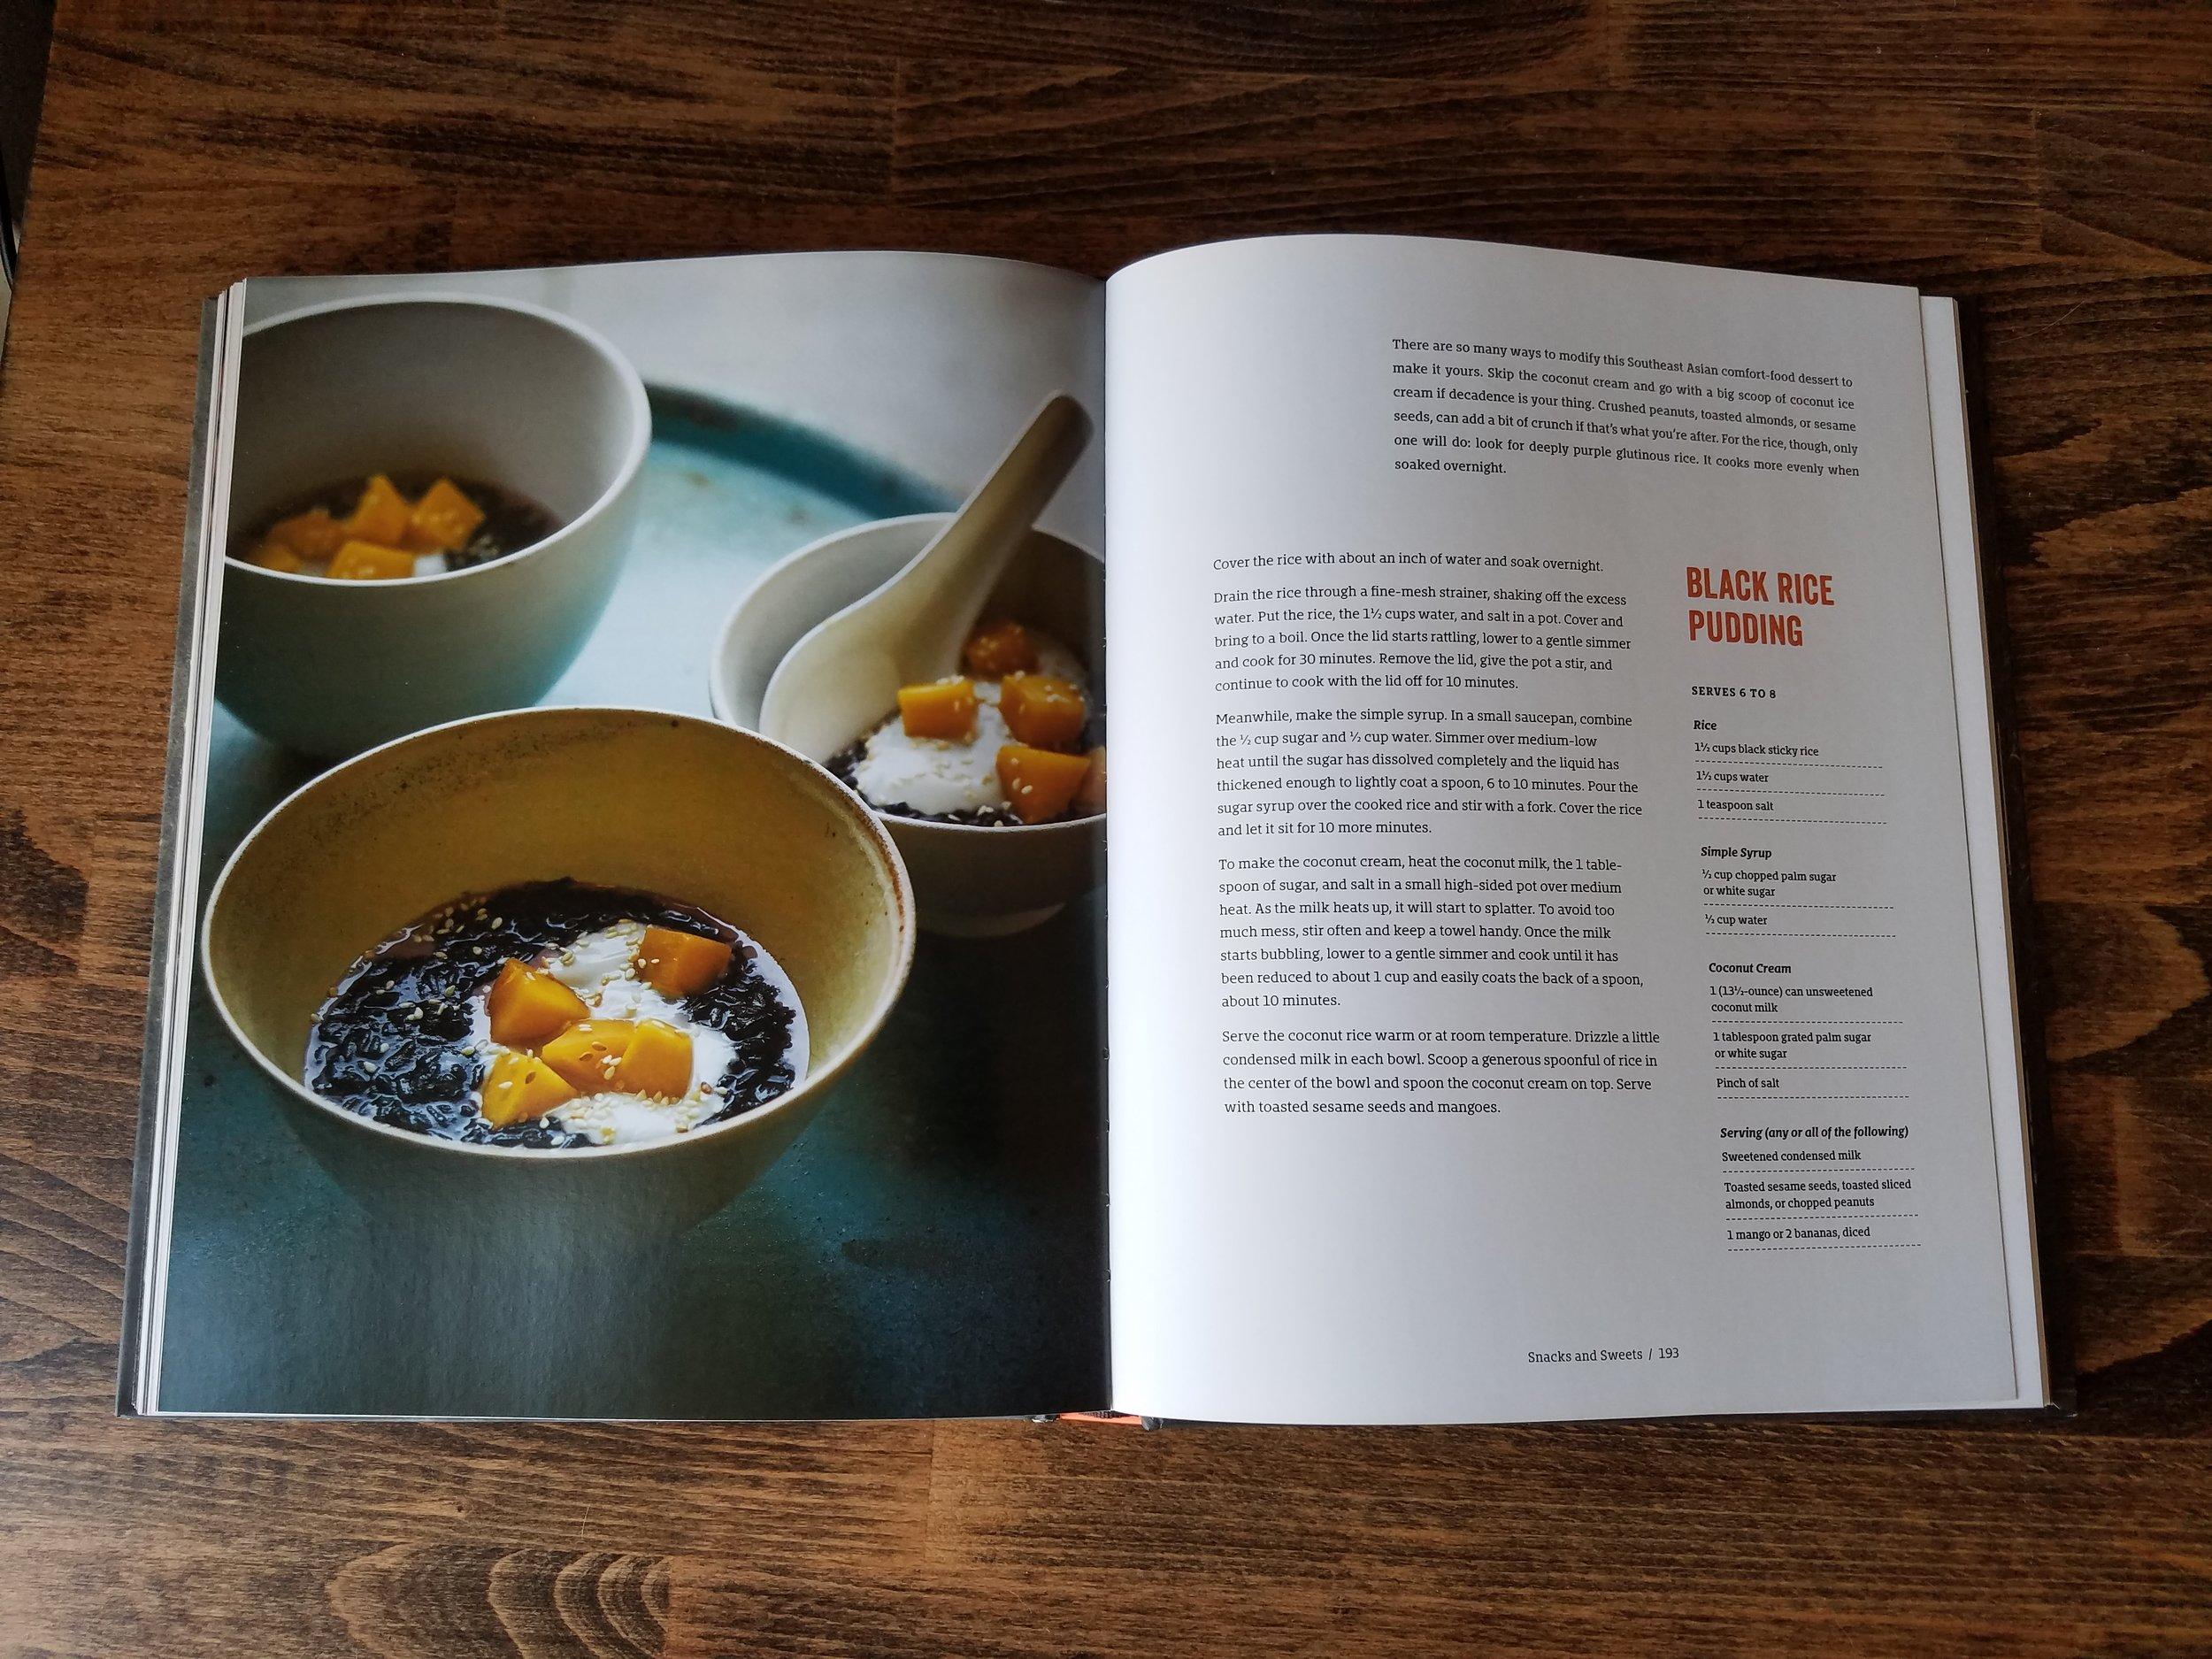 Black Rice Pudding.jpg